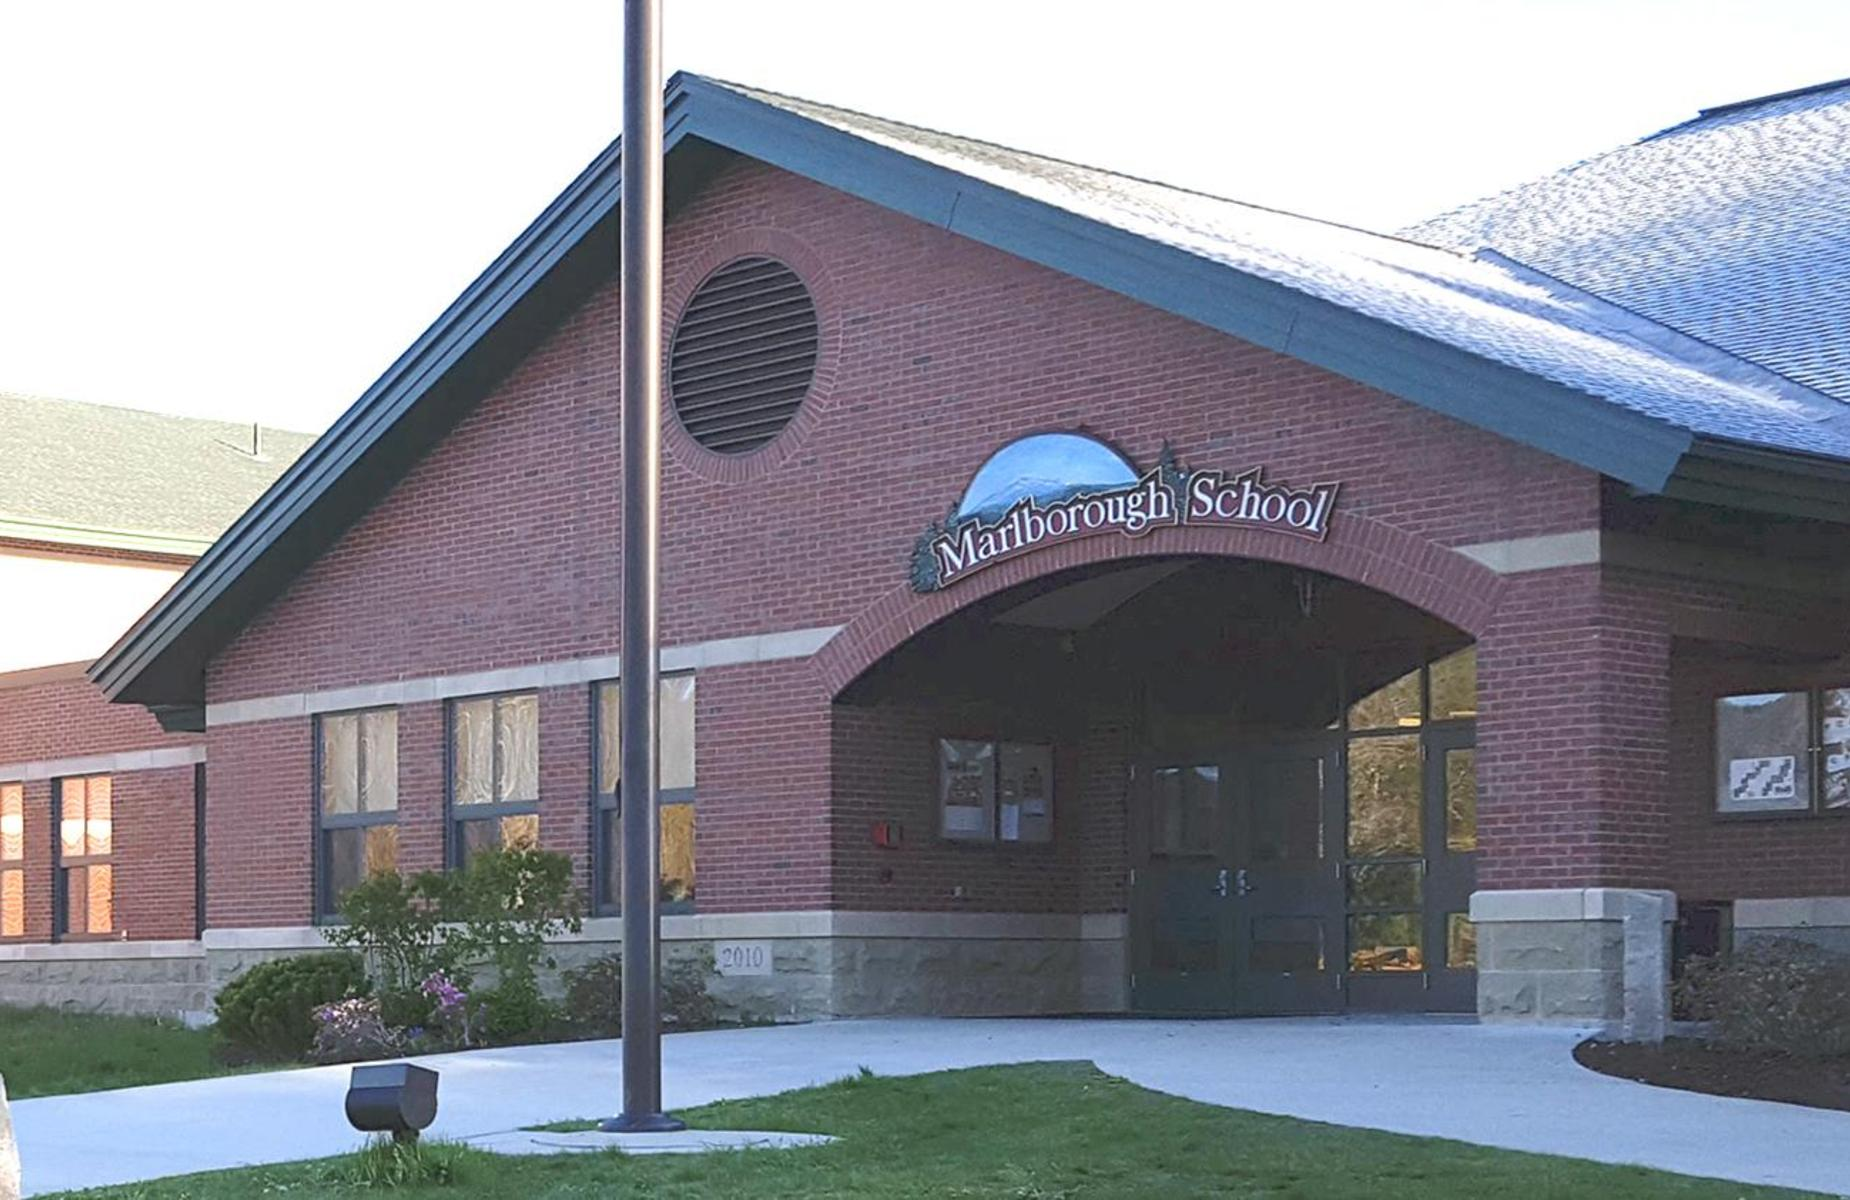 Marlborough School Entryway